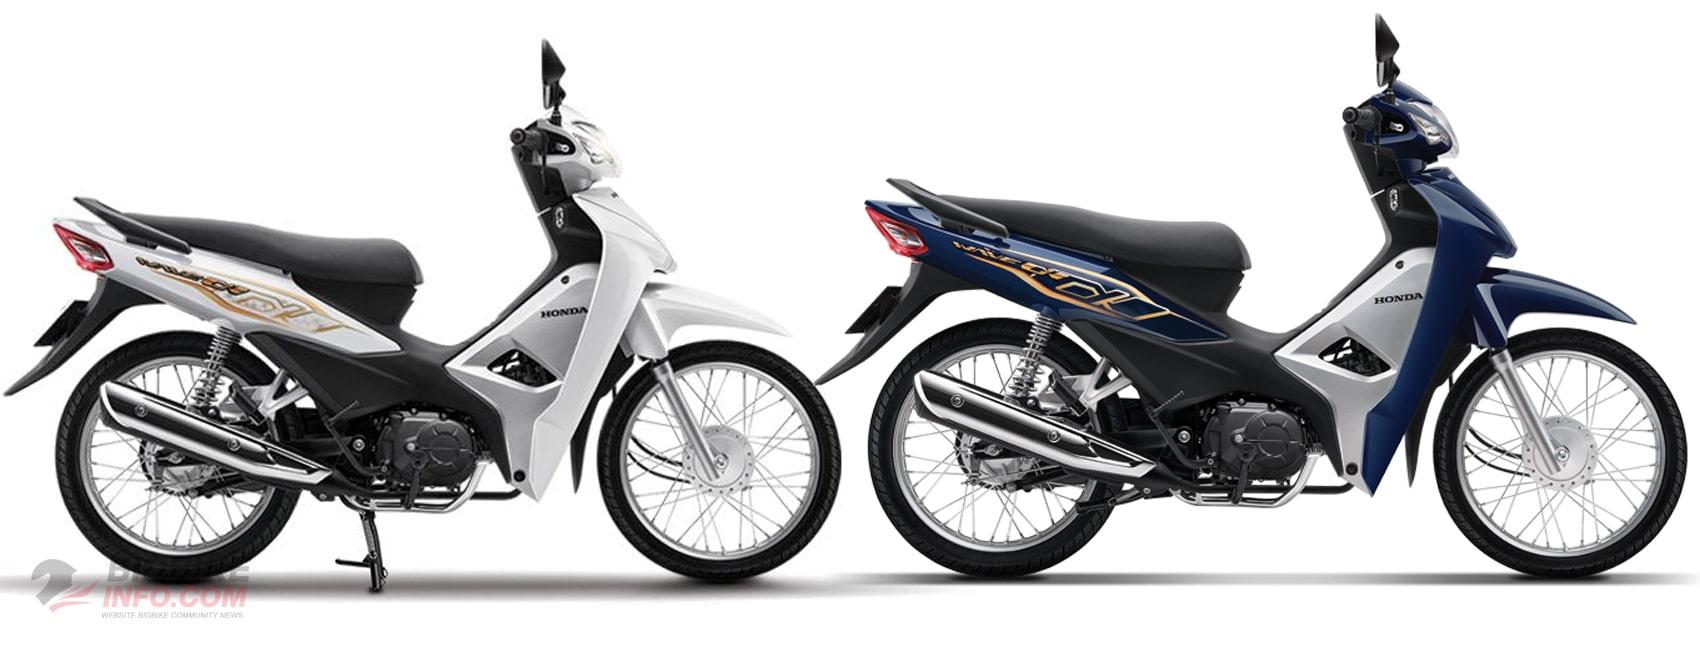 Honda Wave Alpha 110 2020 สีใหม่ สีขาวและสีน้ำเงินเข้ม